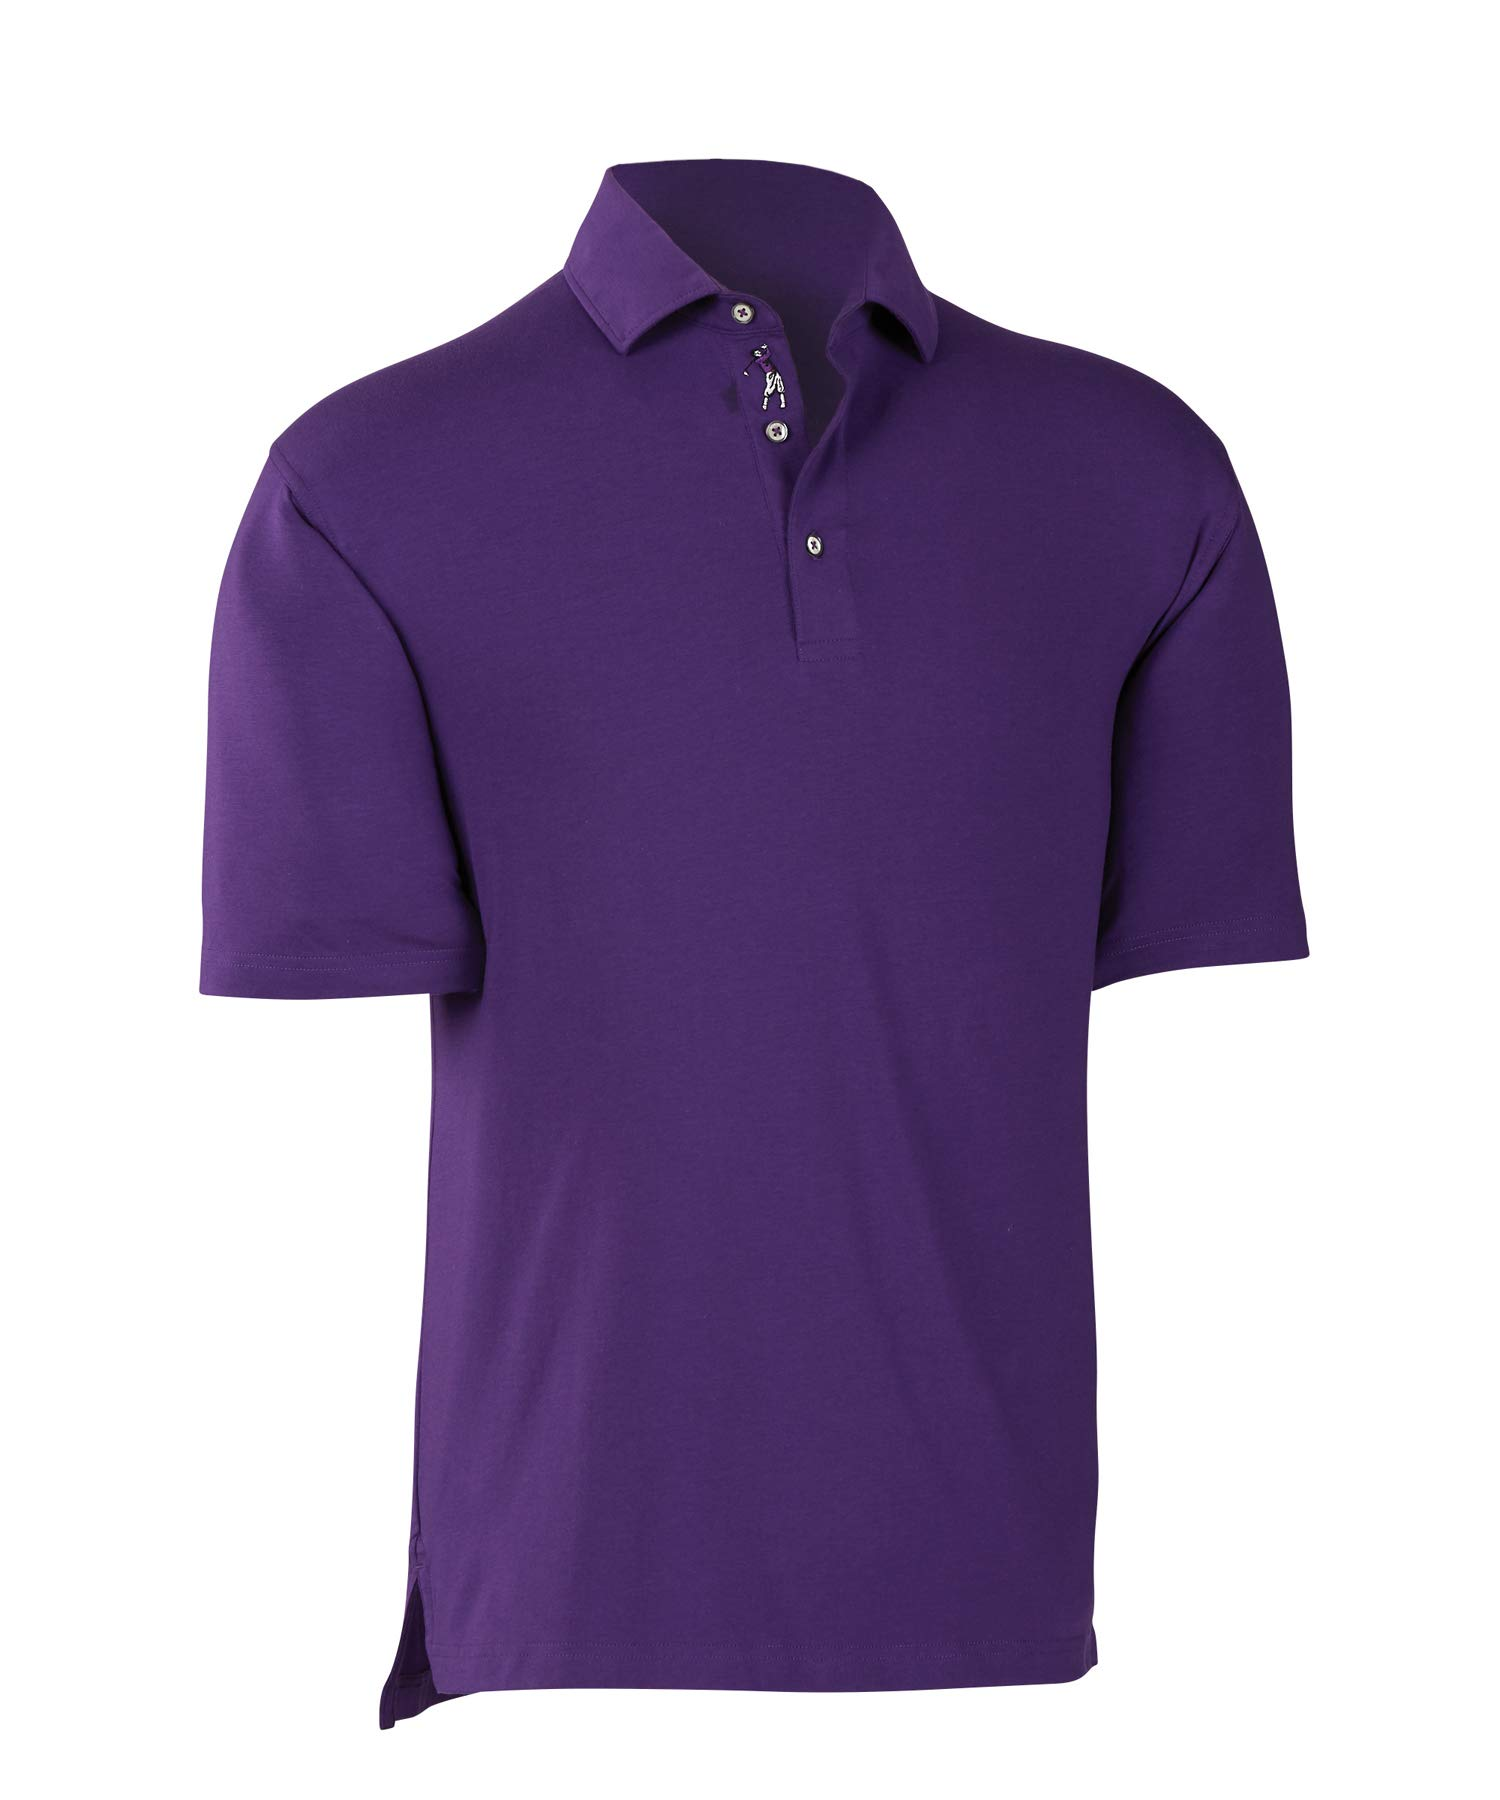 Bobby Jones Golf Polo Shirt - Short Sleeve Solid Polo Shirt for Men - Stretch Liquid Cotton Shirt